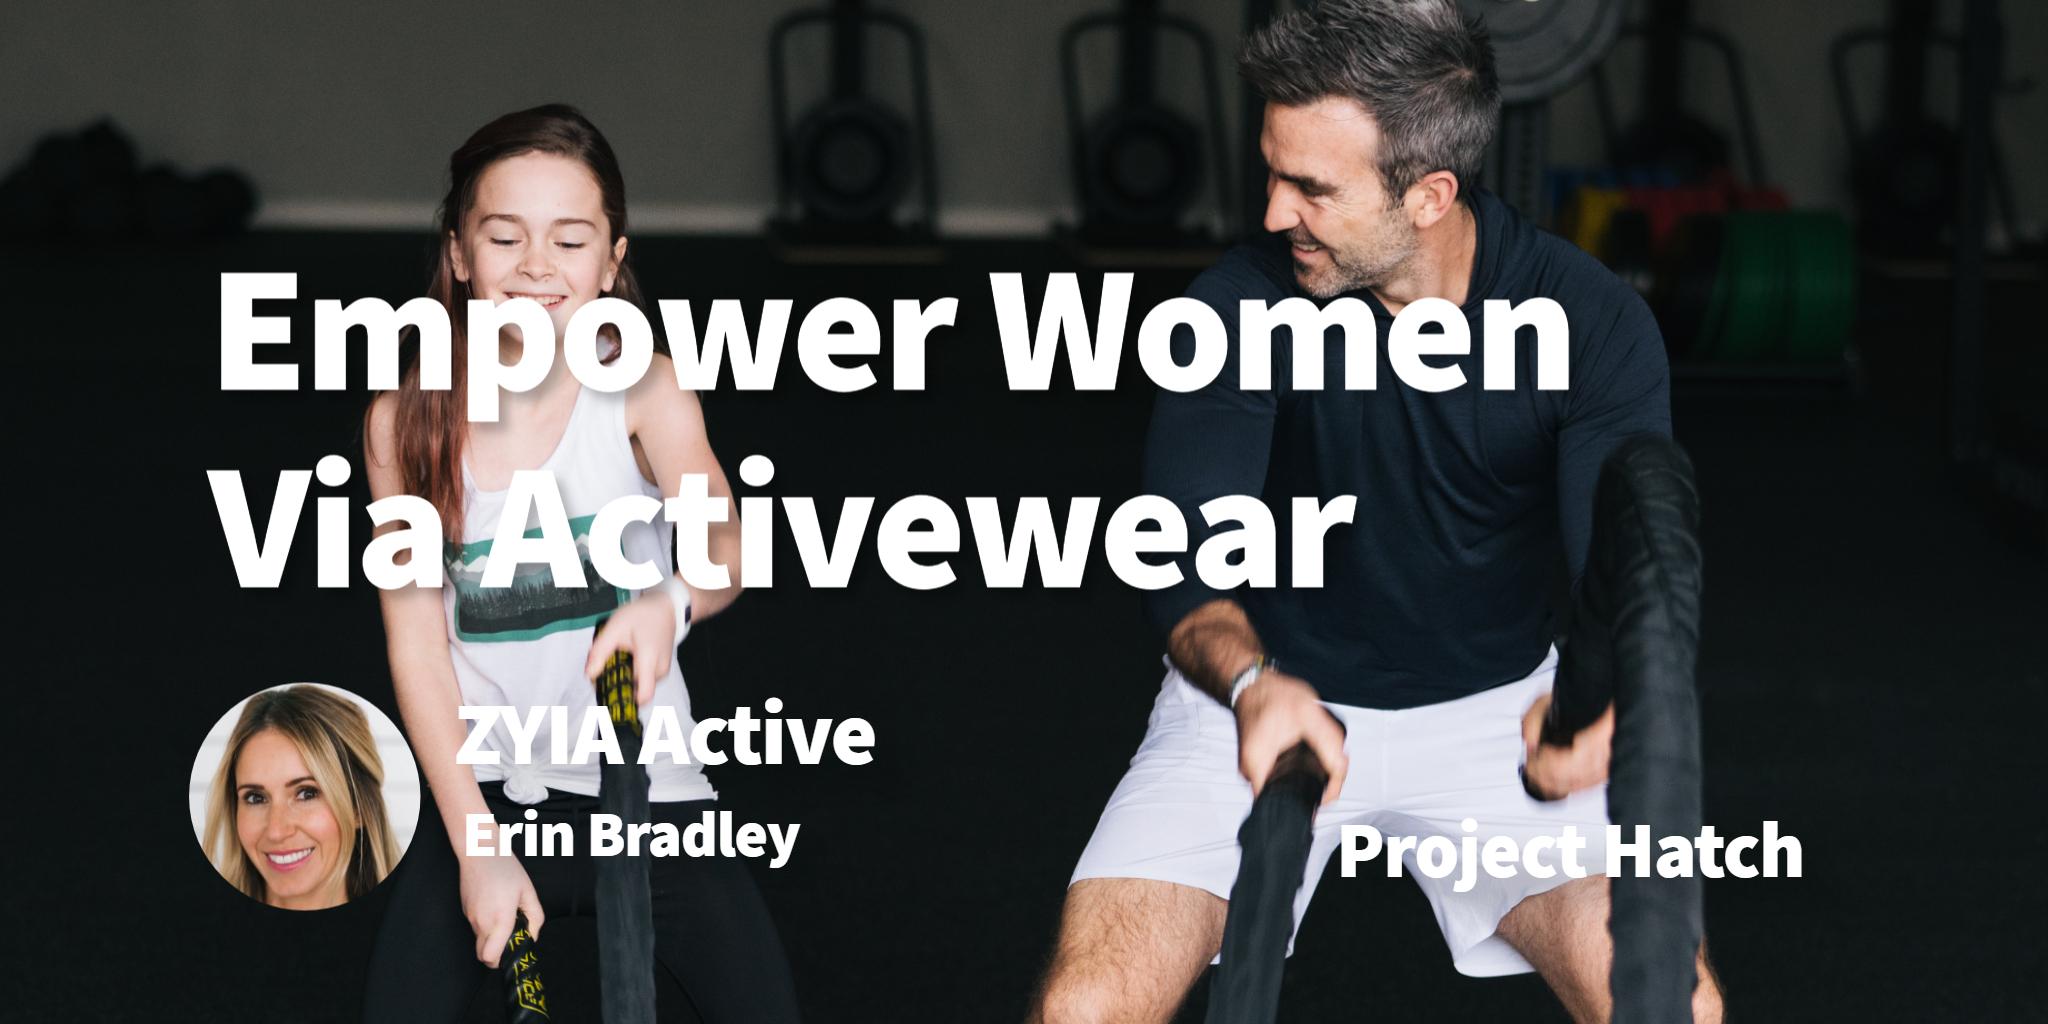 ZYIA Active Erin Bradley